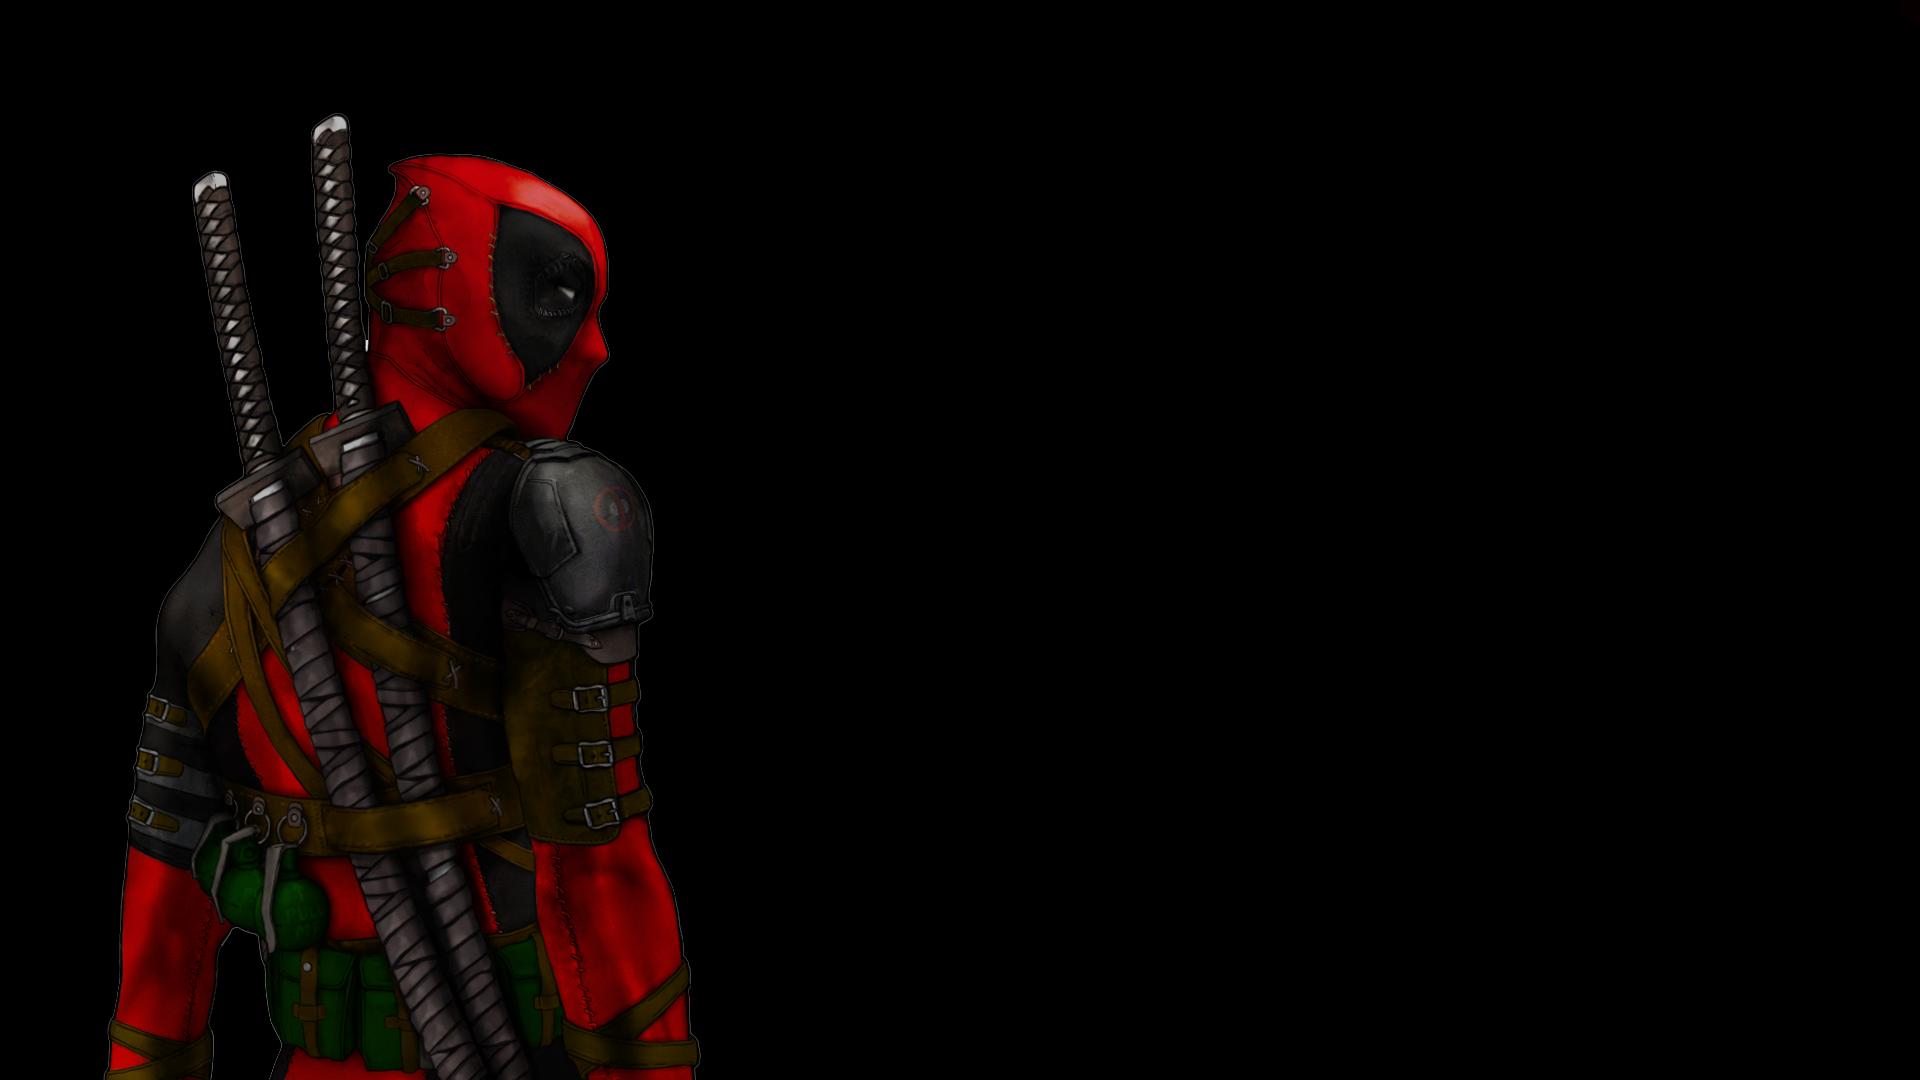 Deadpool With Katana Wallpapers HD Desktop and Mobile 1920x1080